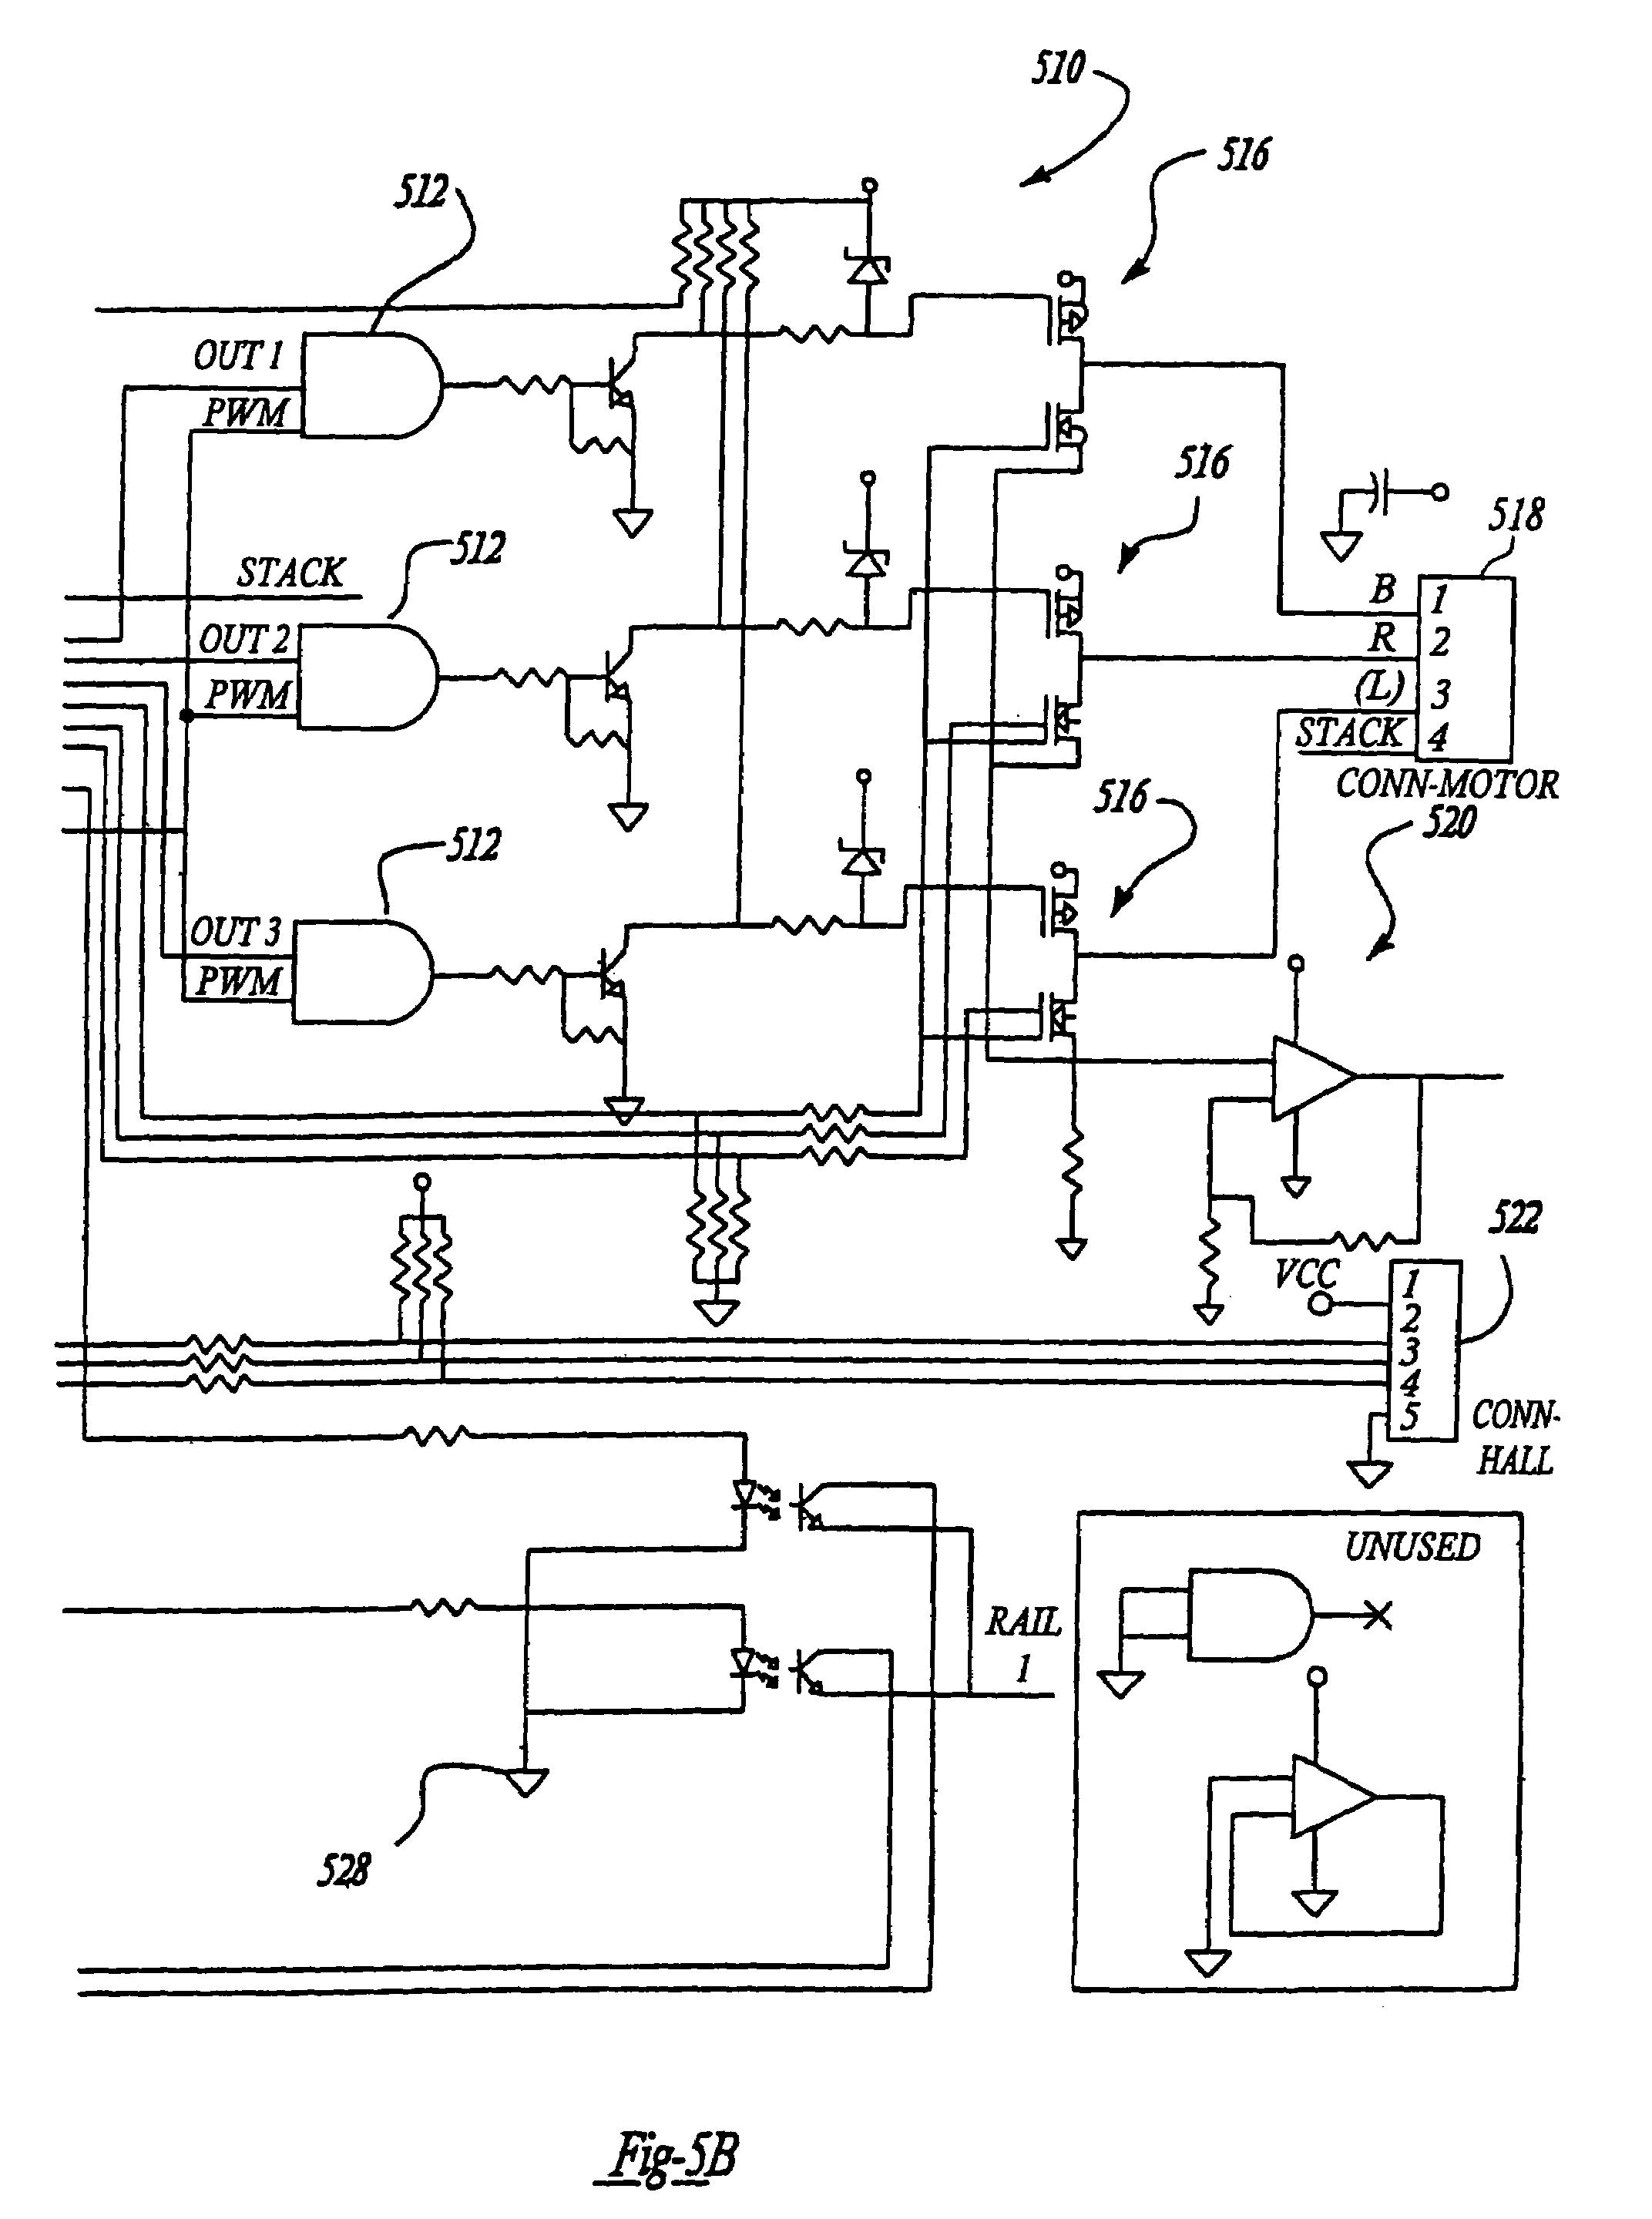 Lionel Parts Diagram